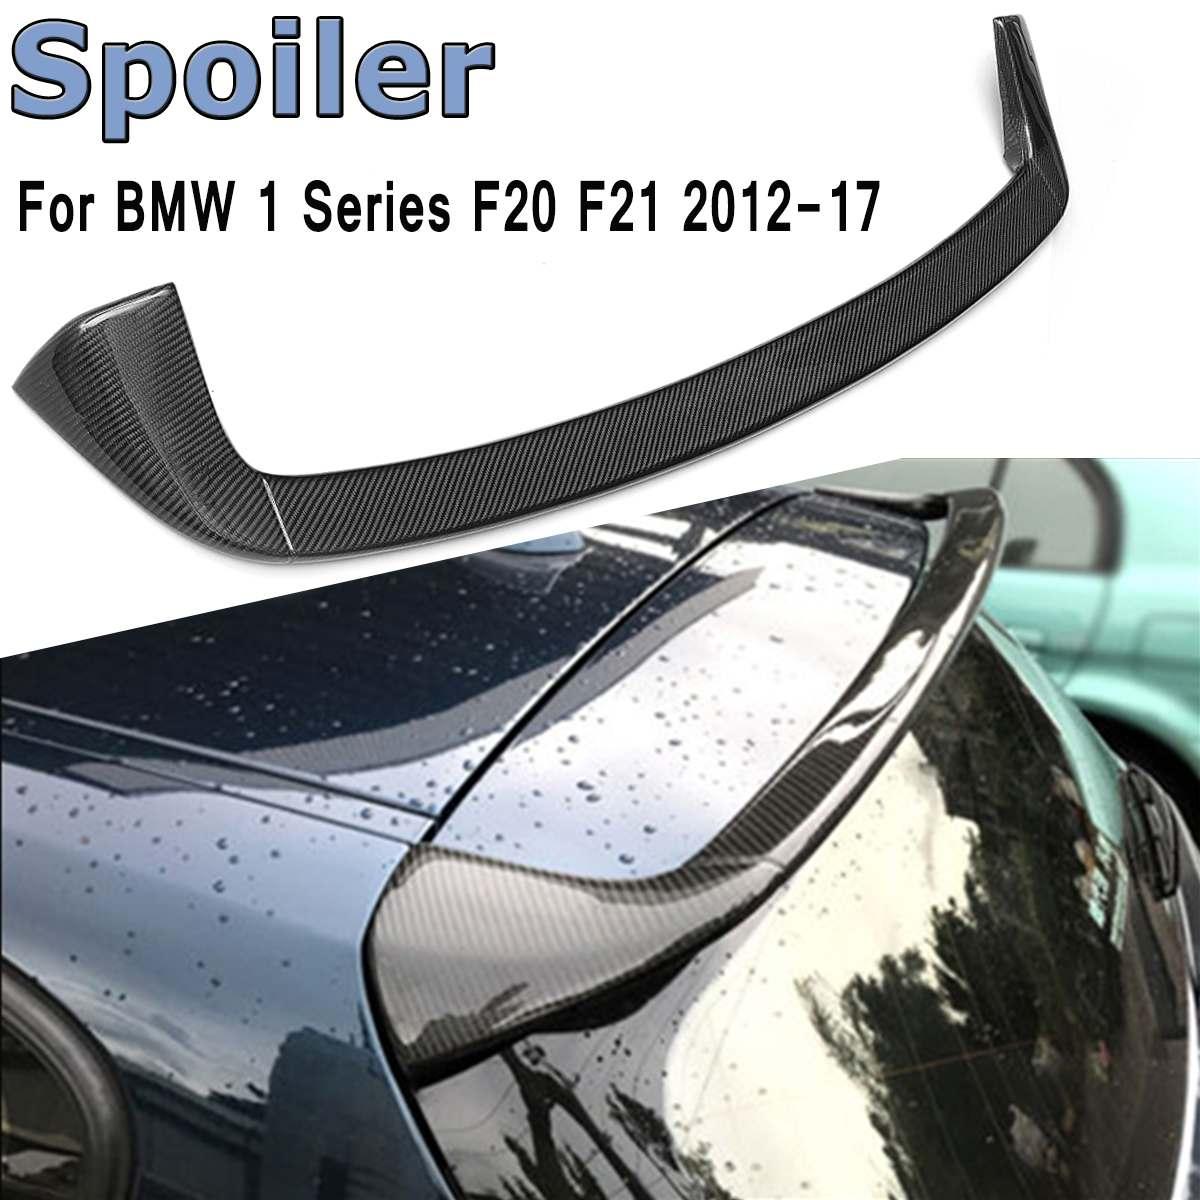 Real Carbon Fiber FRP Glossy Rear Roof Windshield Spoiler Lip Wing For BMW F20 F20LCI F21 118i 120i 125i 135i 2012-2017